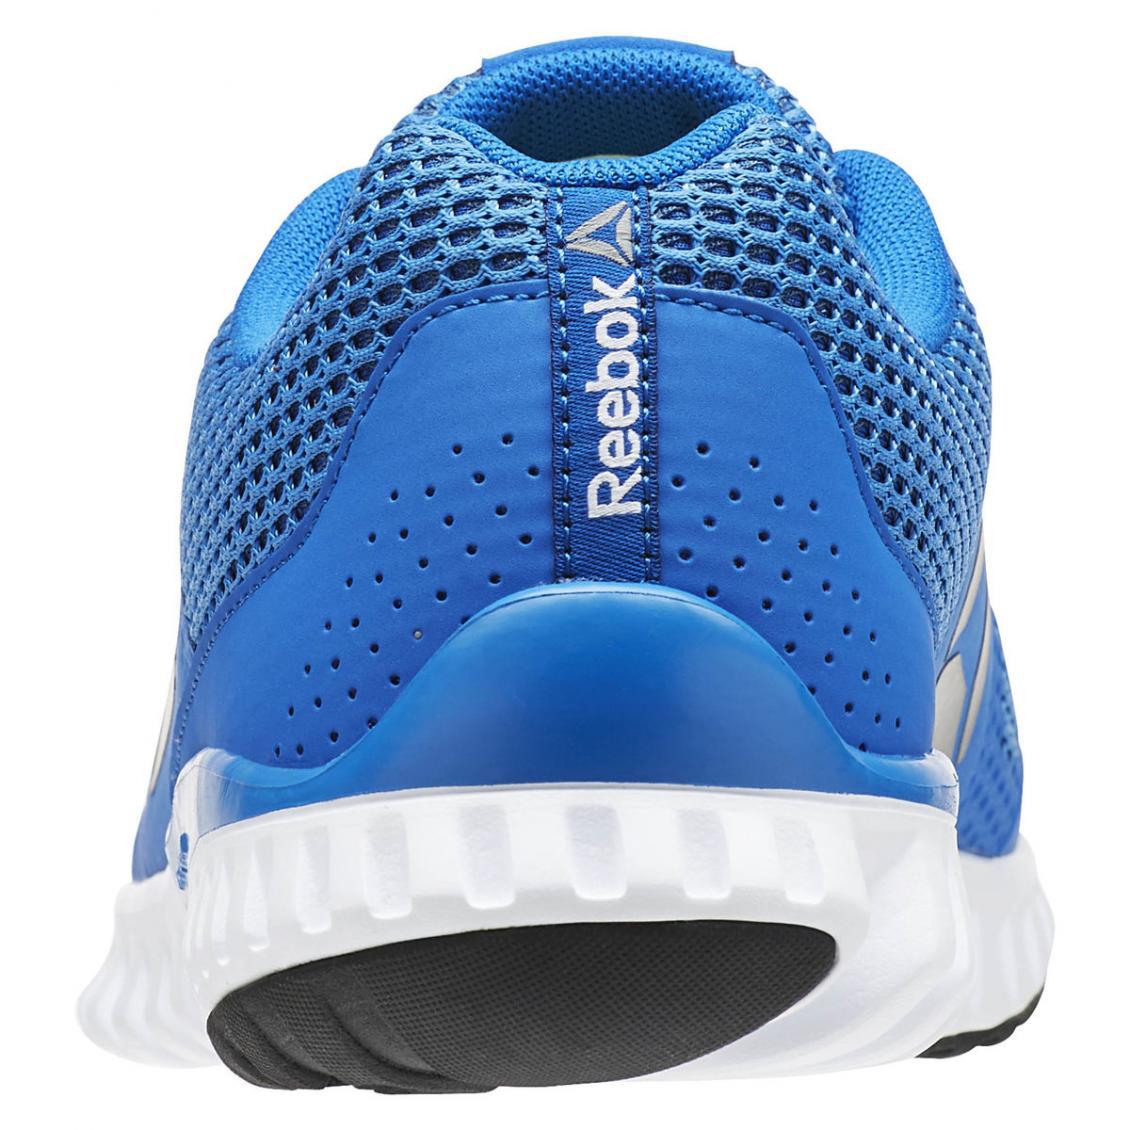 Blue – Reebok Twistform Blaze 3.0 MTM Mens Awesome Blue / Brave Blue / White / Black / Pewter